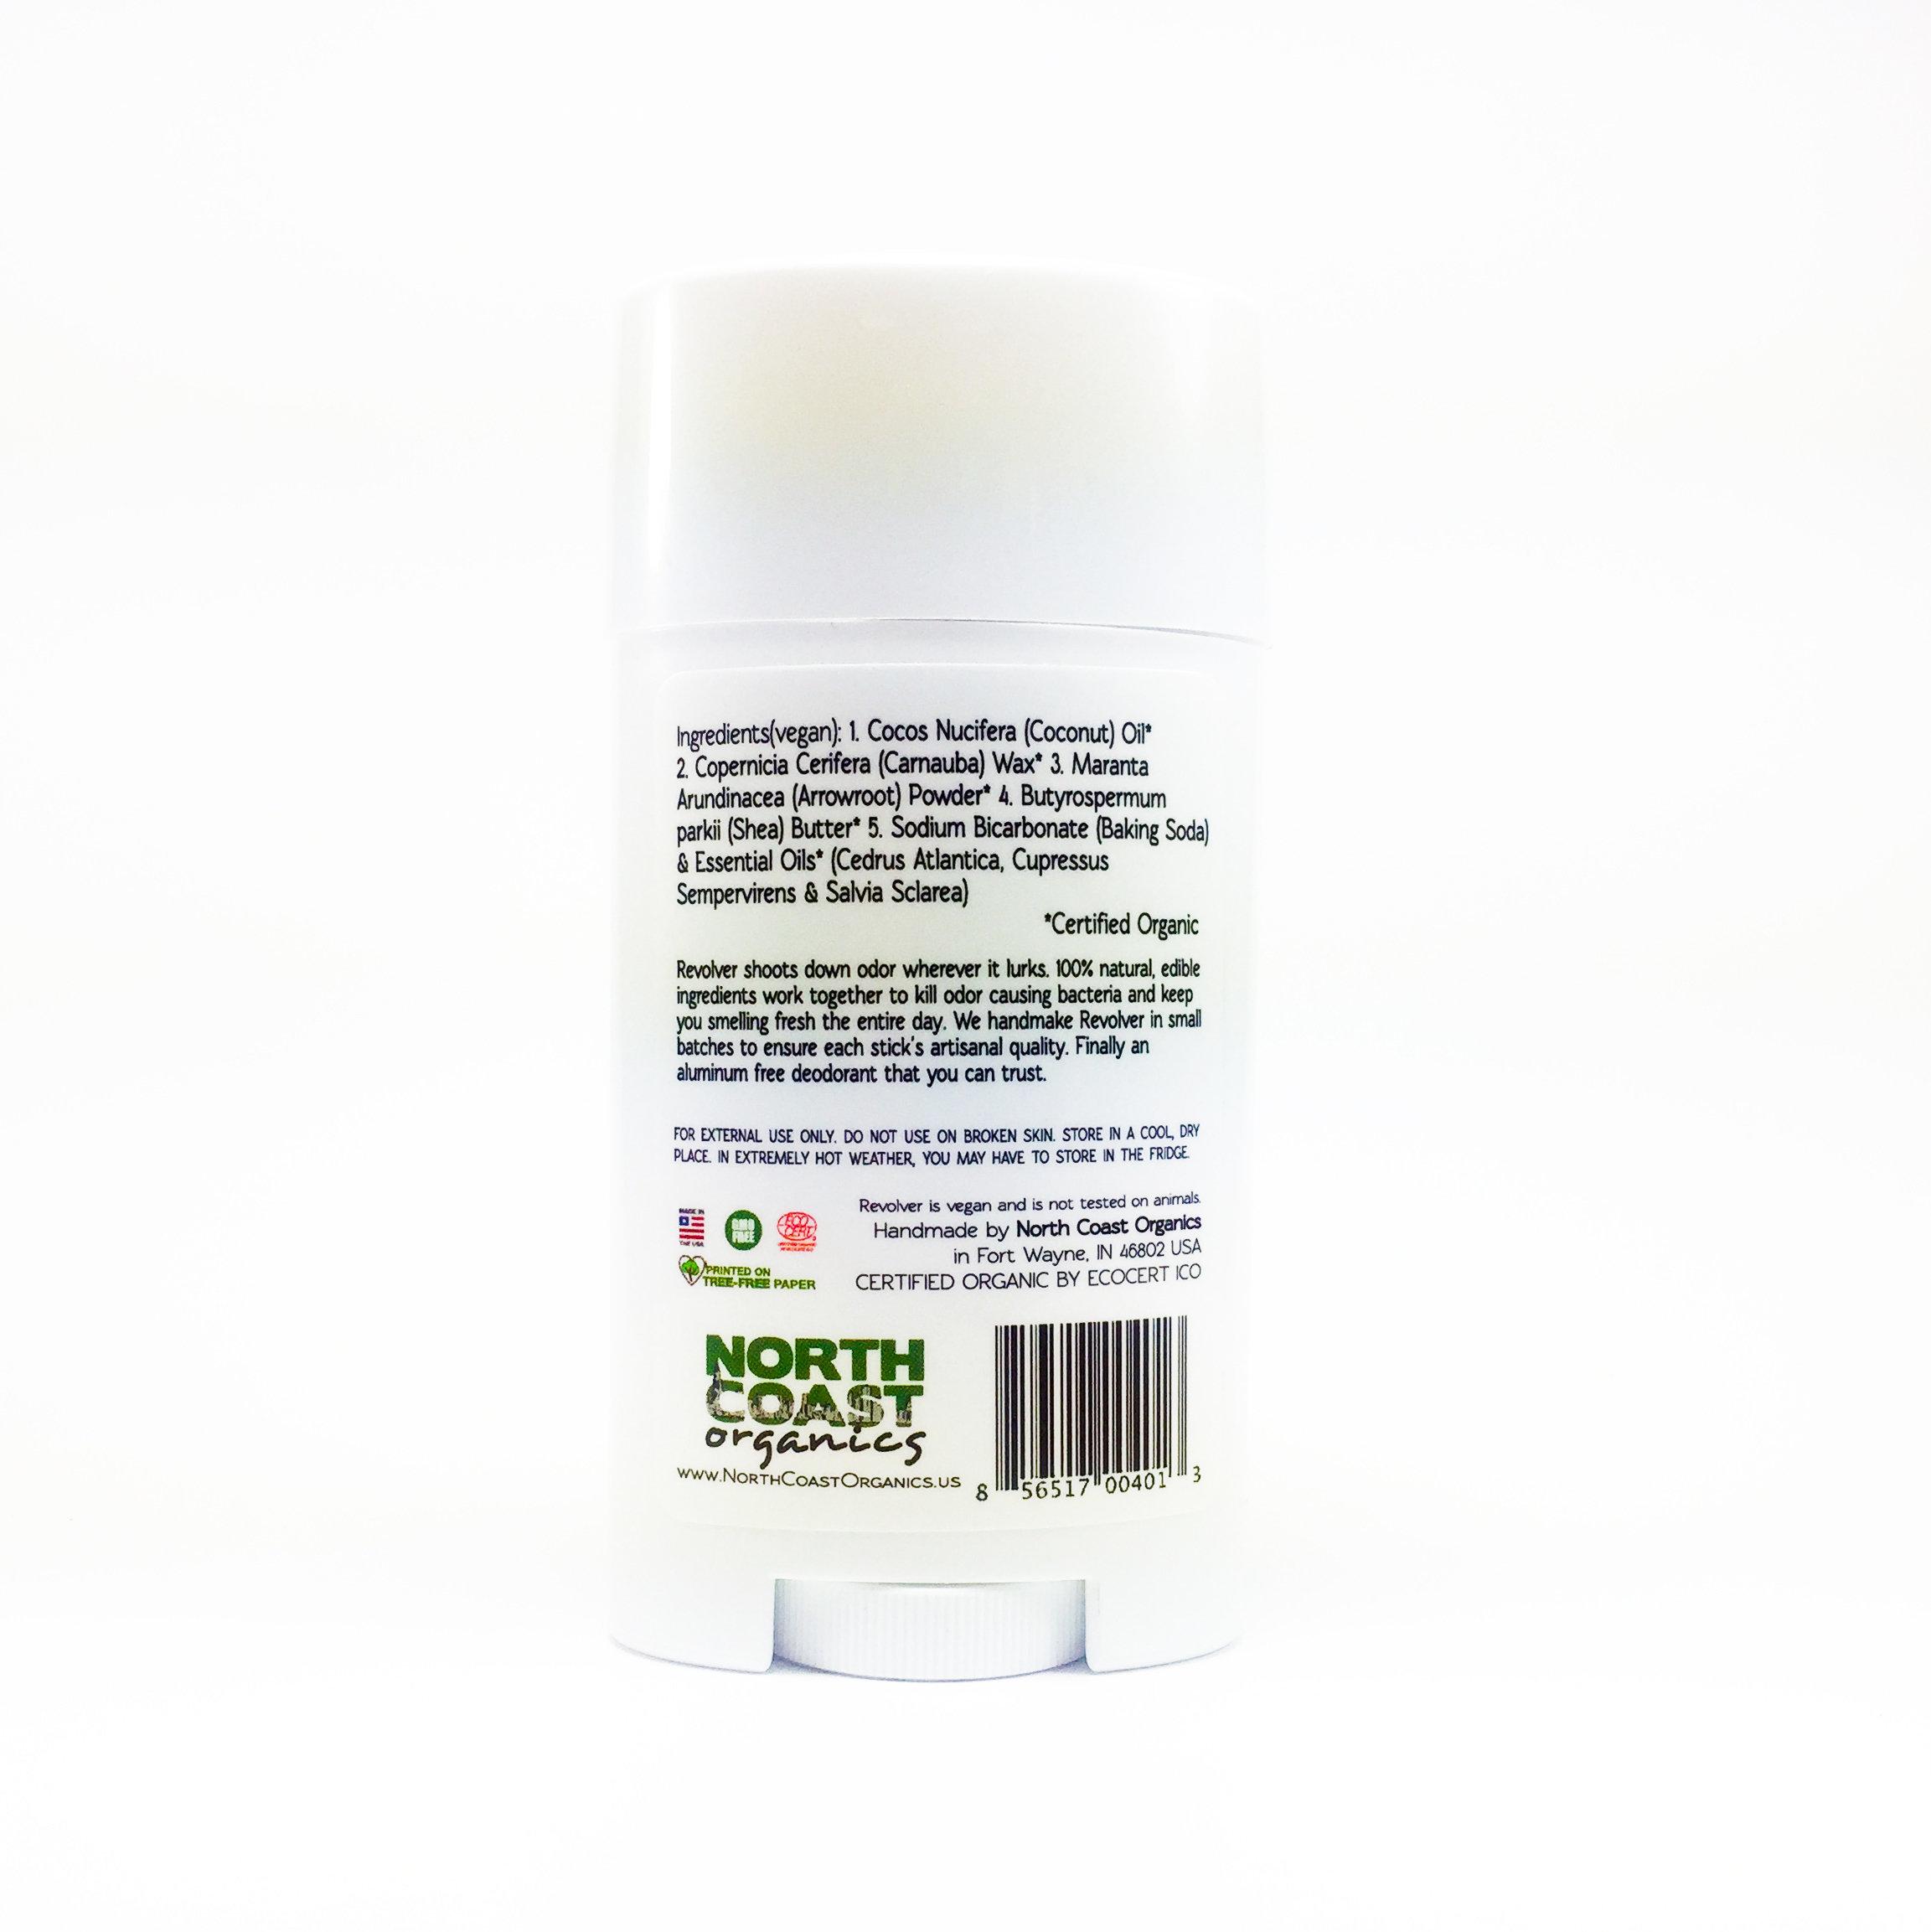 Revolver Organic Deodorant Back Label